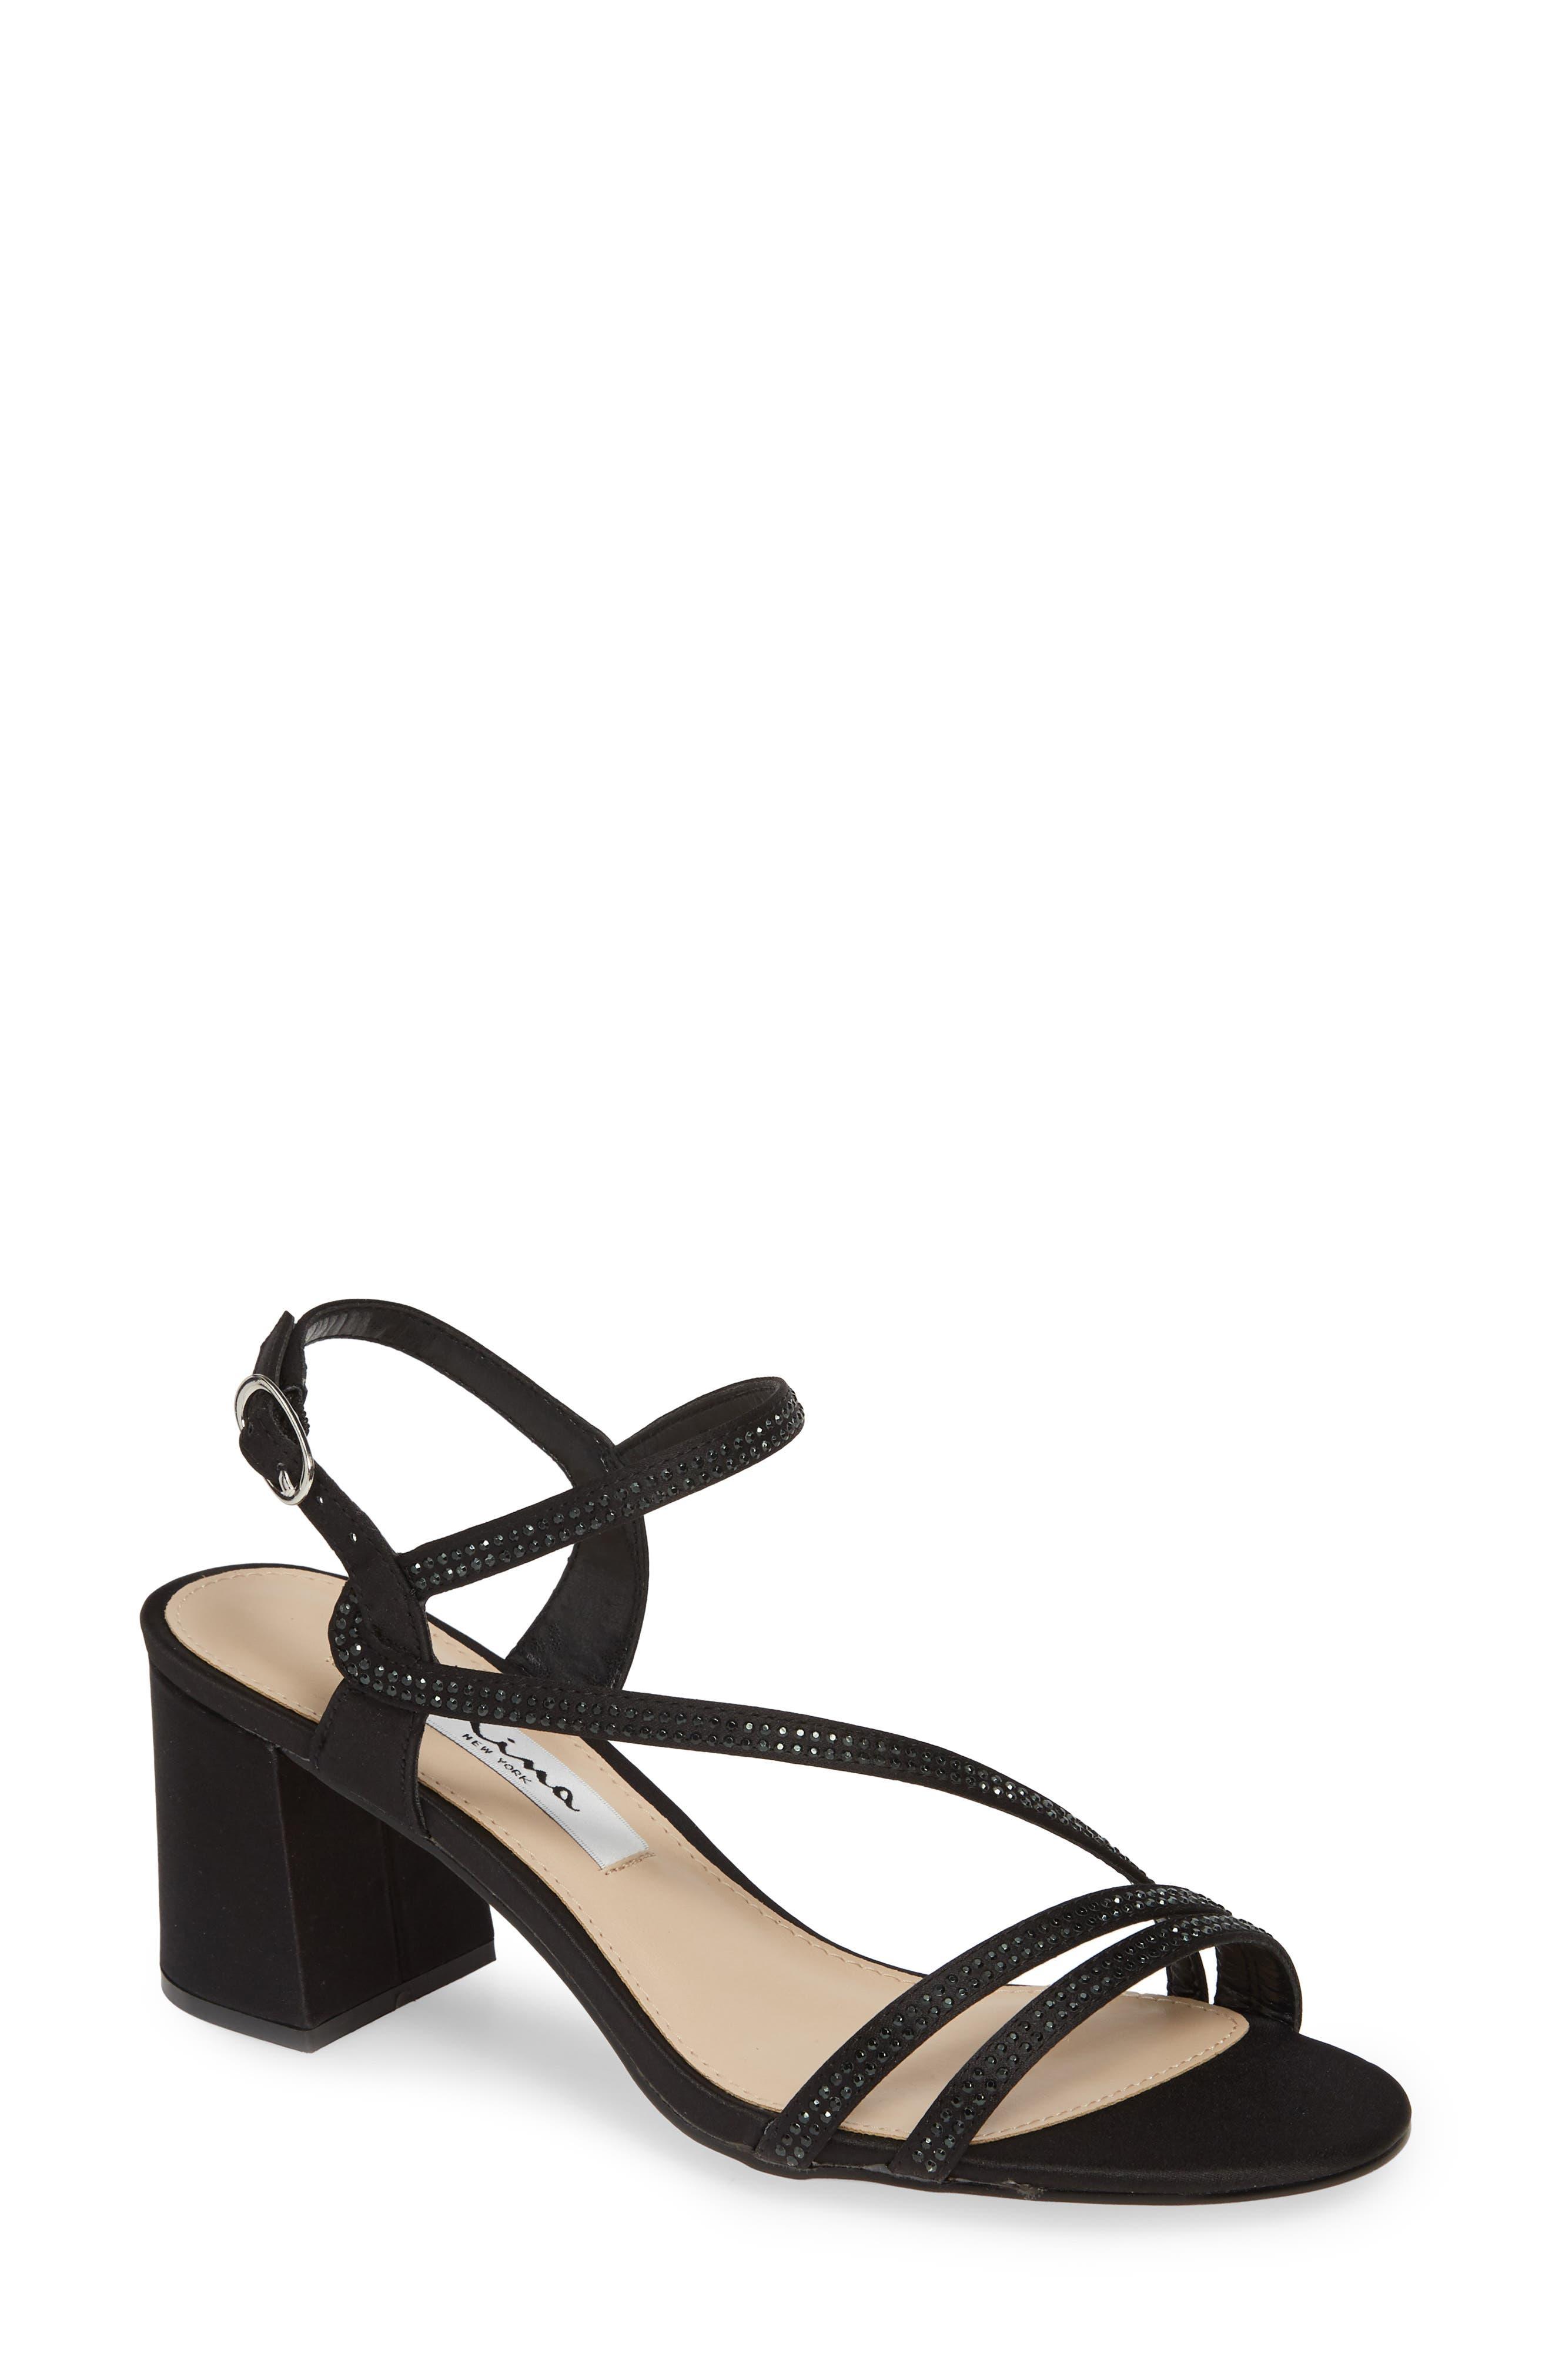 NINA, Naura Block Heel Sandal, Main thumbnail 1, color, BLACK SATIN